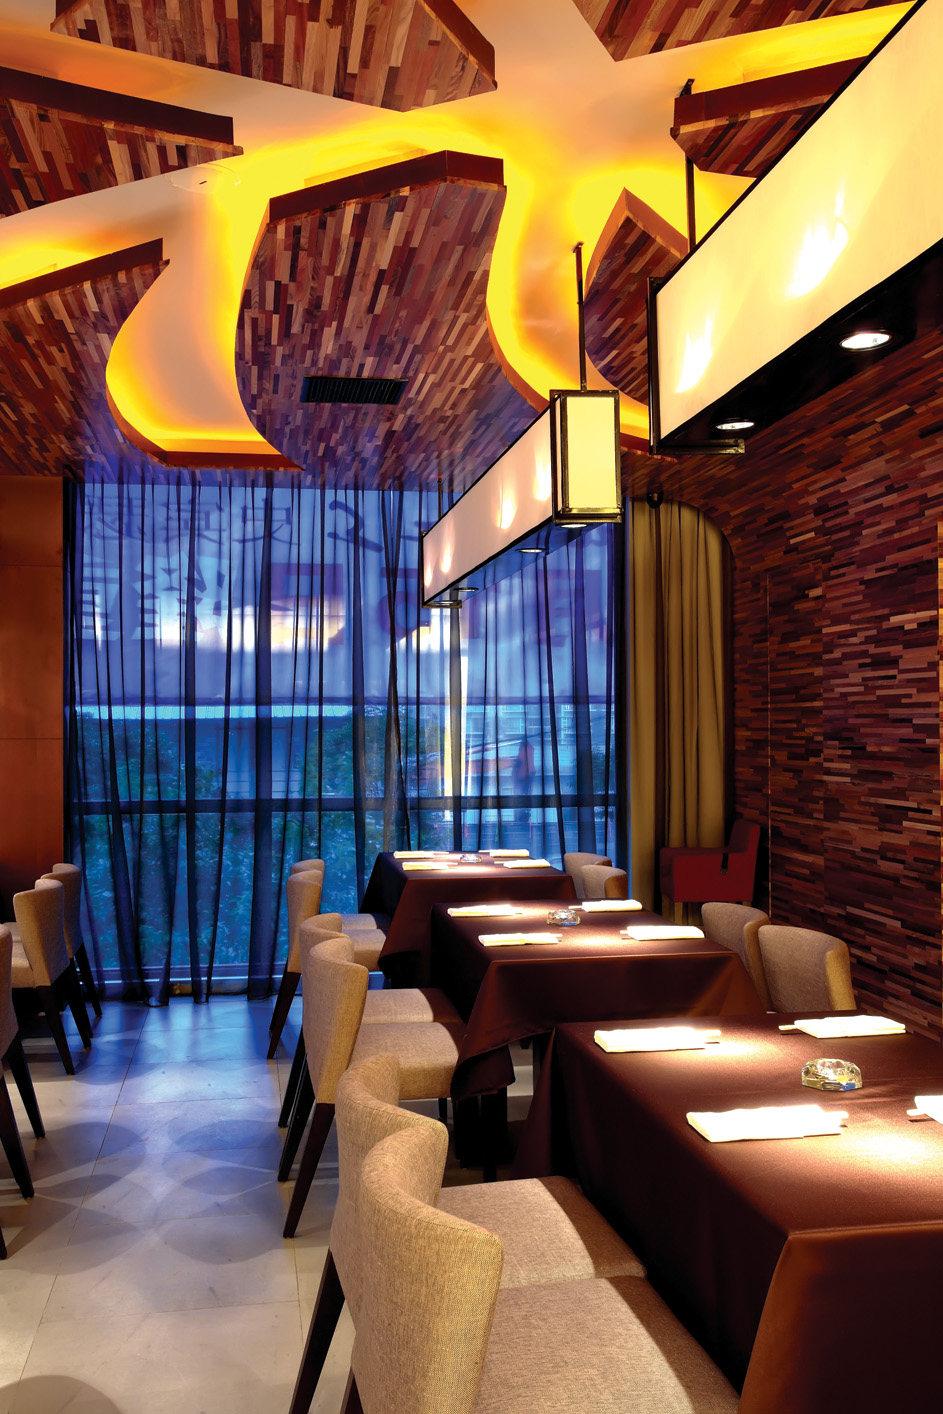 Top restaurant design 高级餐饮空间案例_(谢)史宾瑟创意日本料理店 a (25).jpg